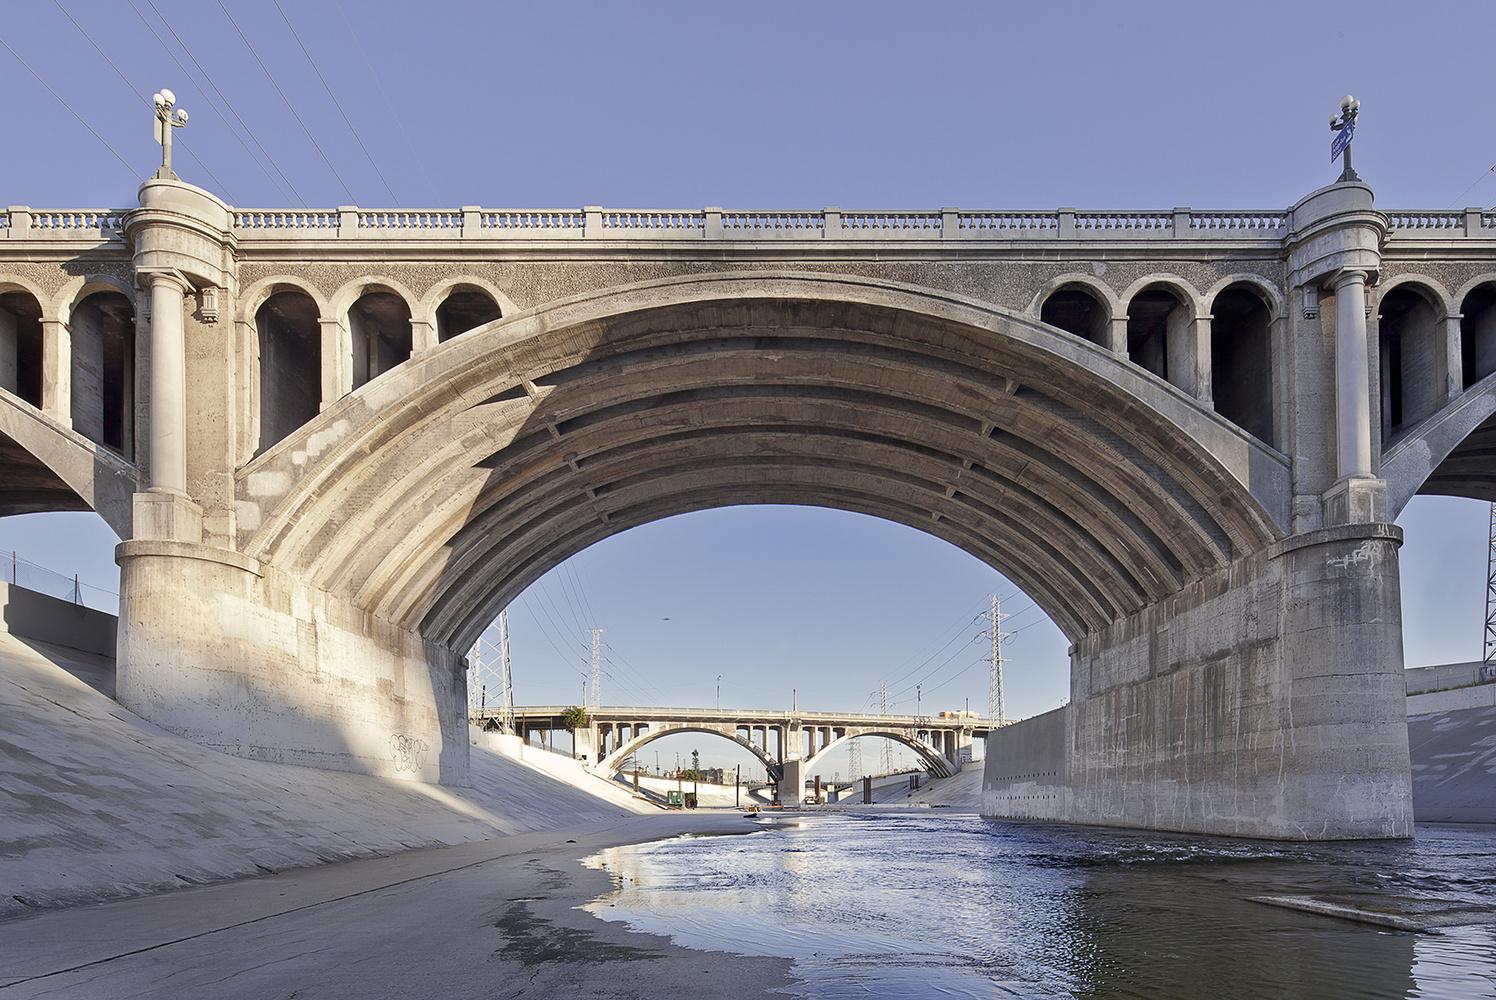 Buena Vista Bridge (N. Broadway) by Lane Barden